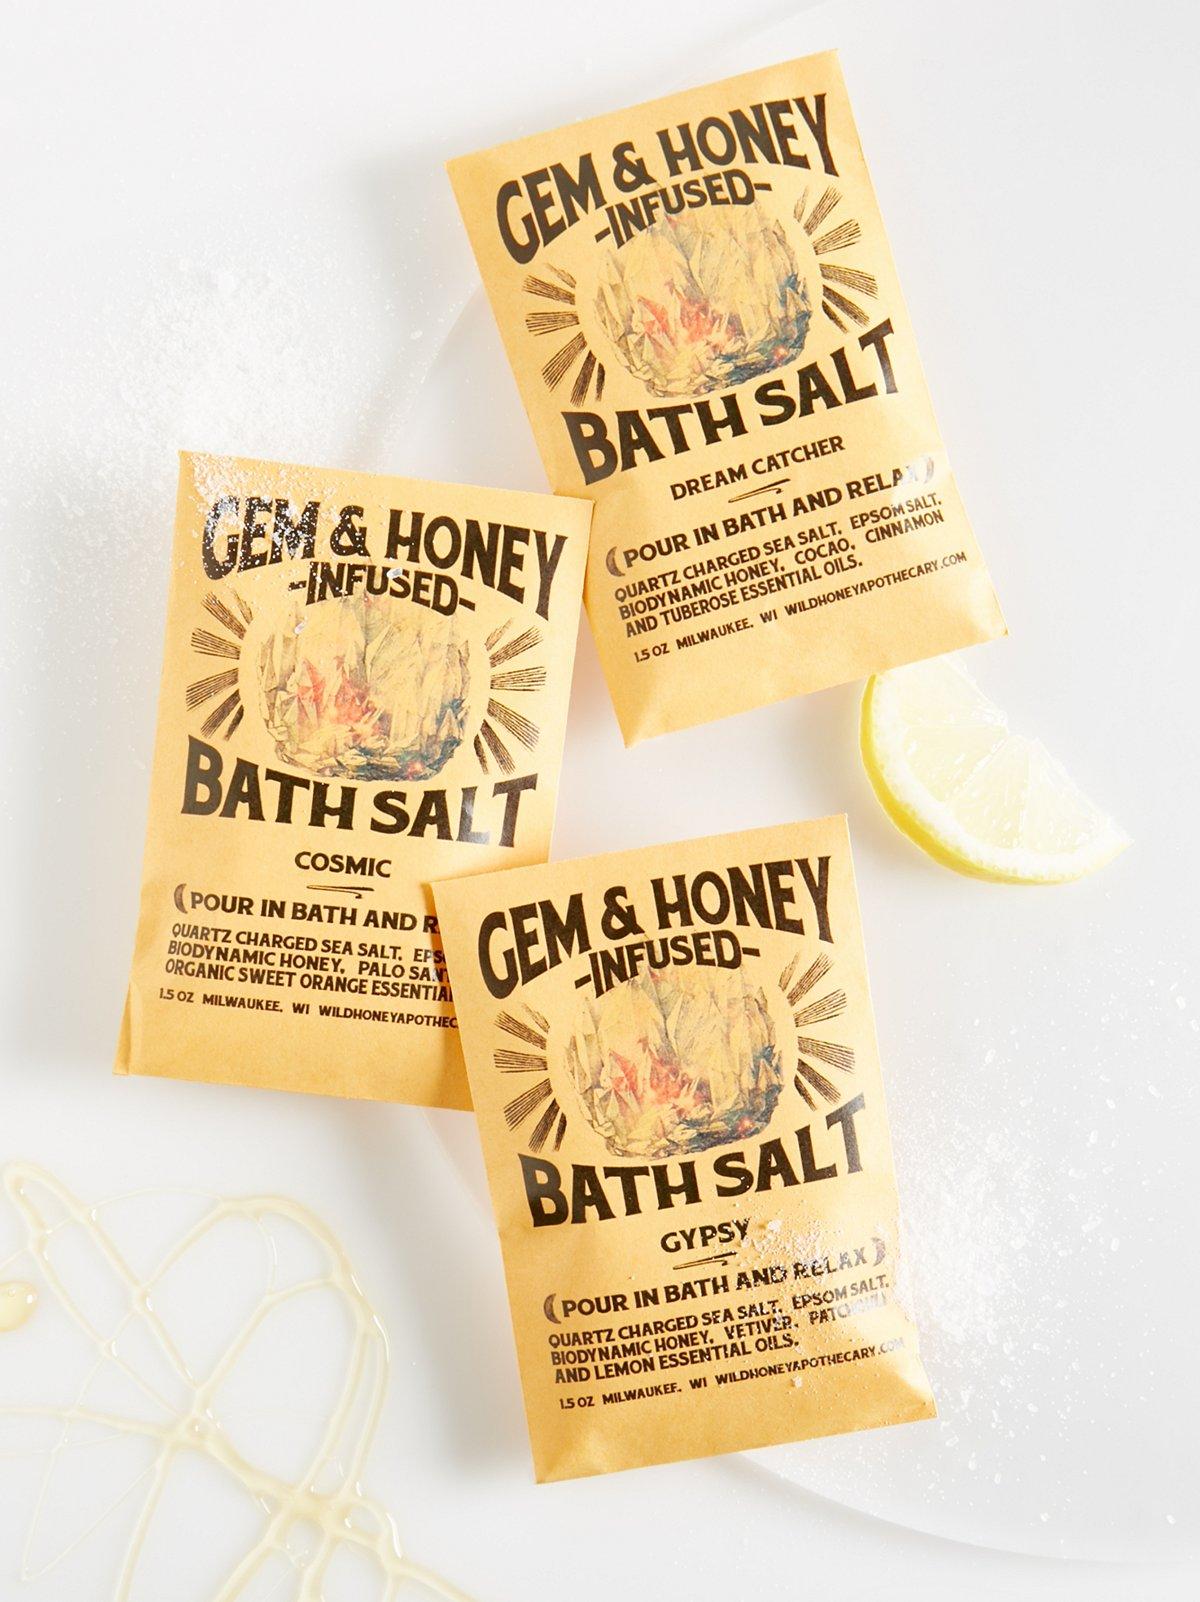 Gem & Honey Infused Bath Salts